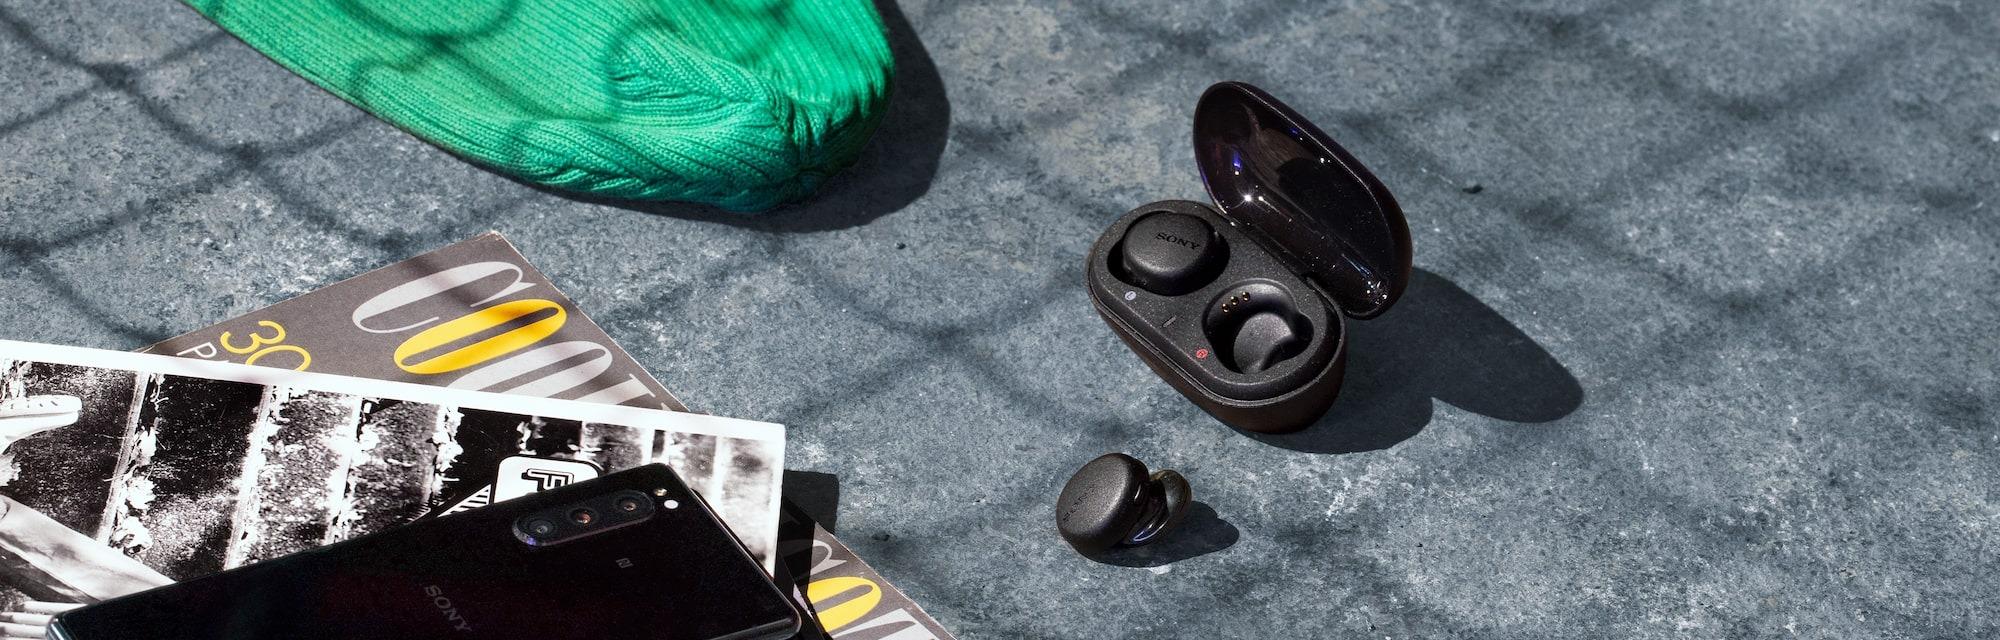 Tai nghe Sony WF-XB700